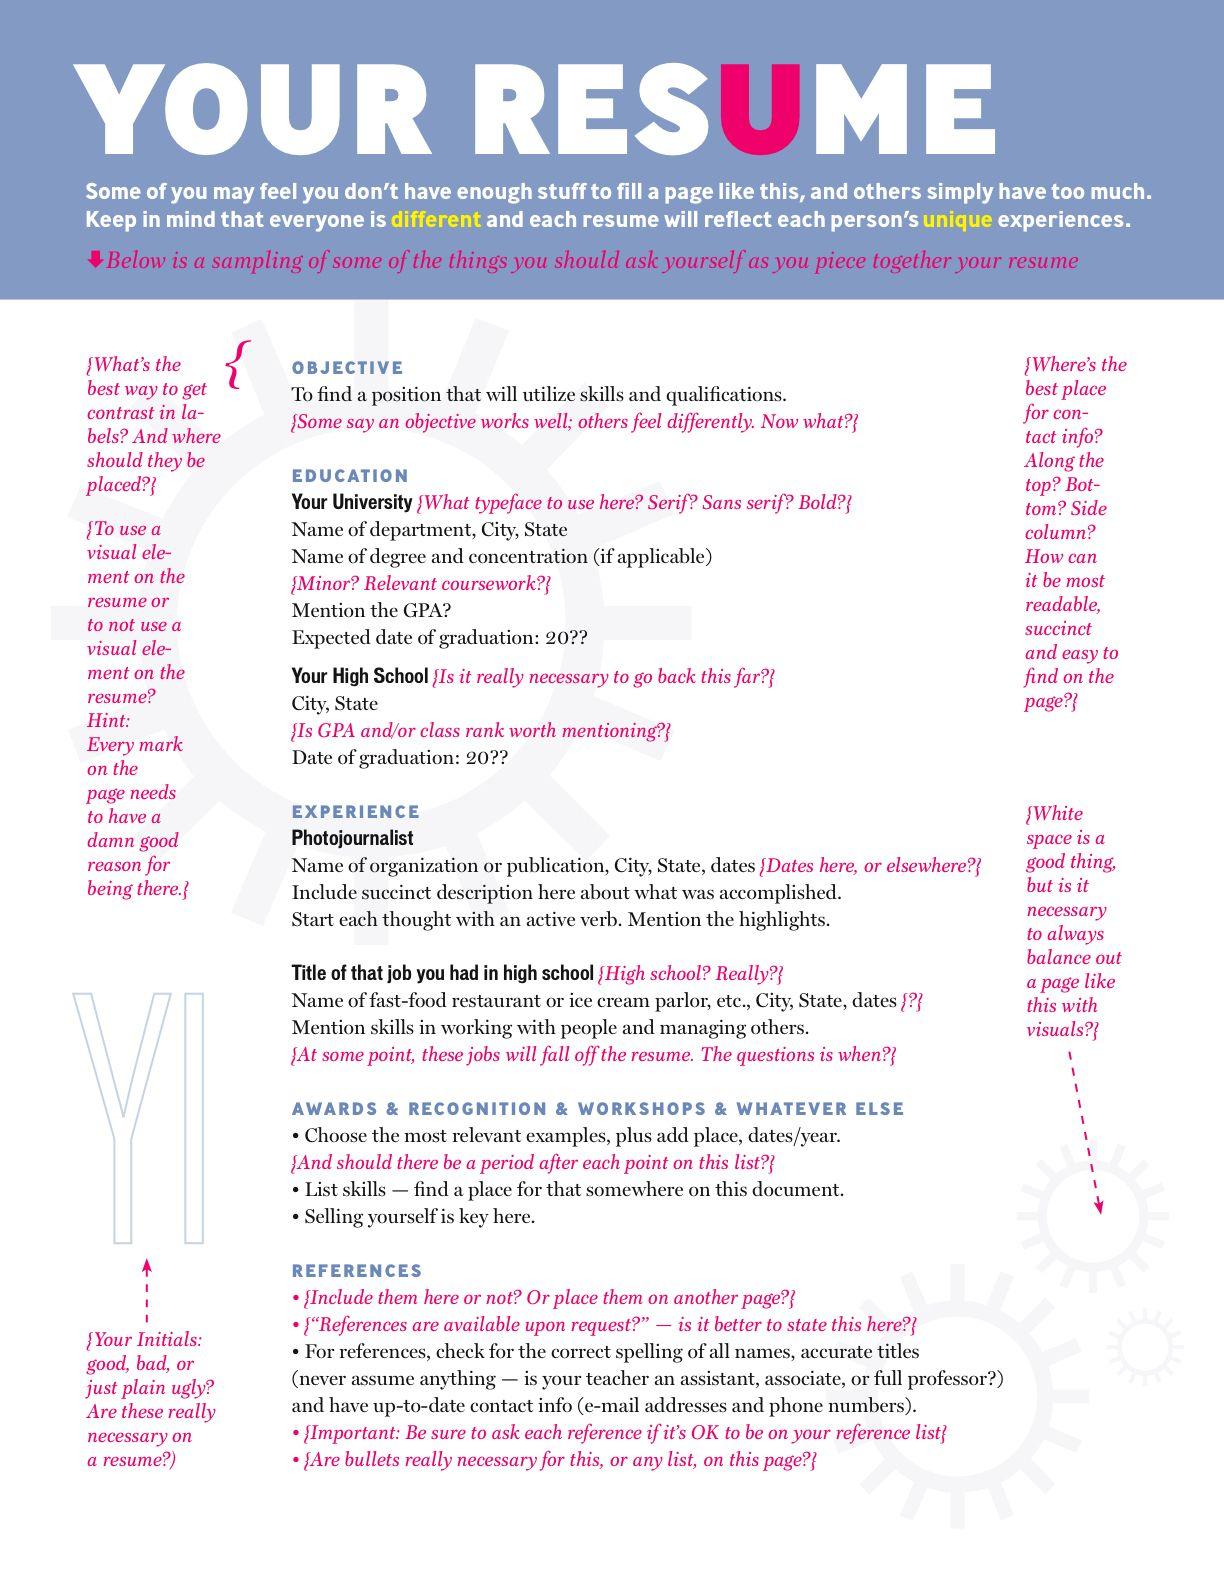 law student resume objective enforcement it graduate 1 resume resume objective student